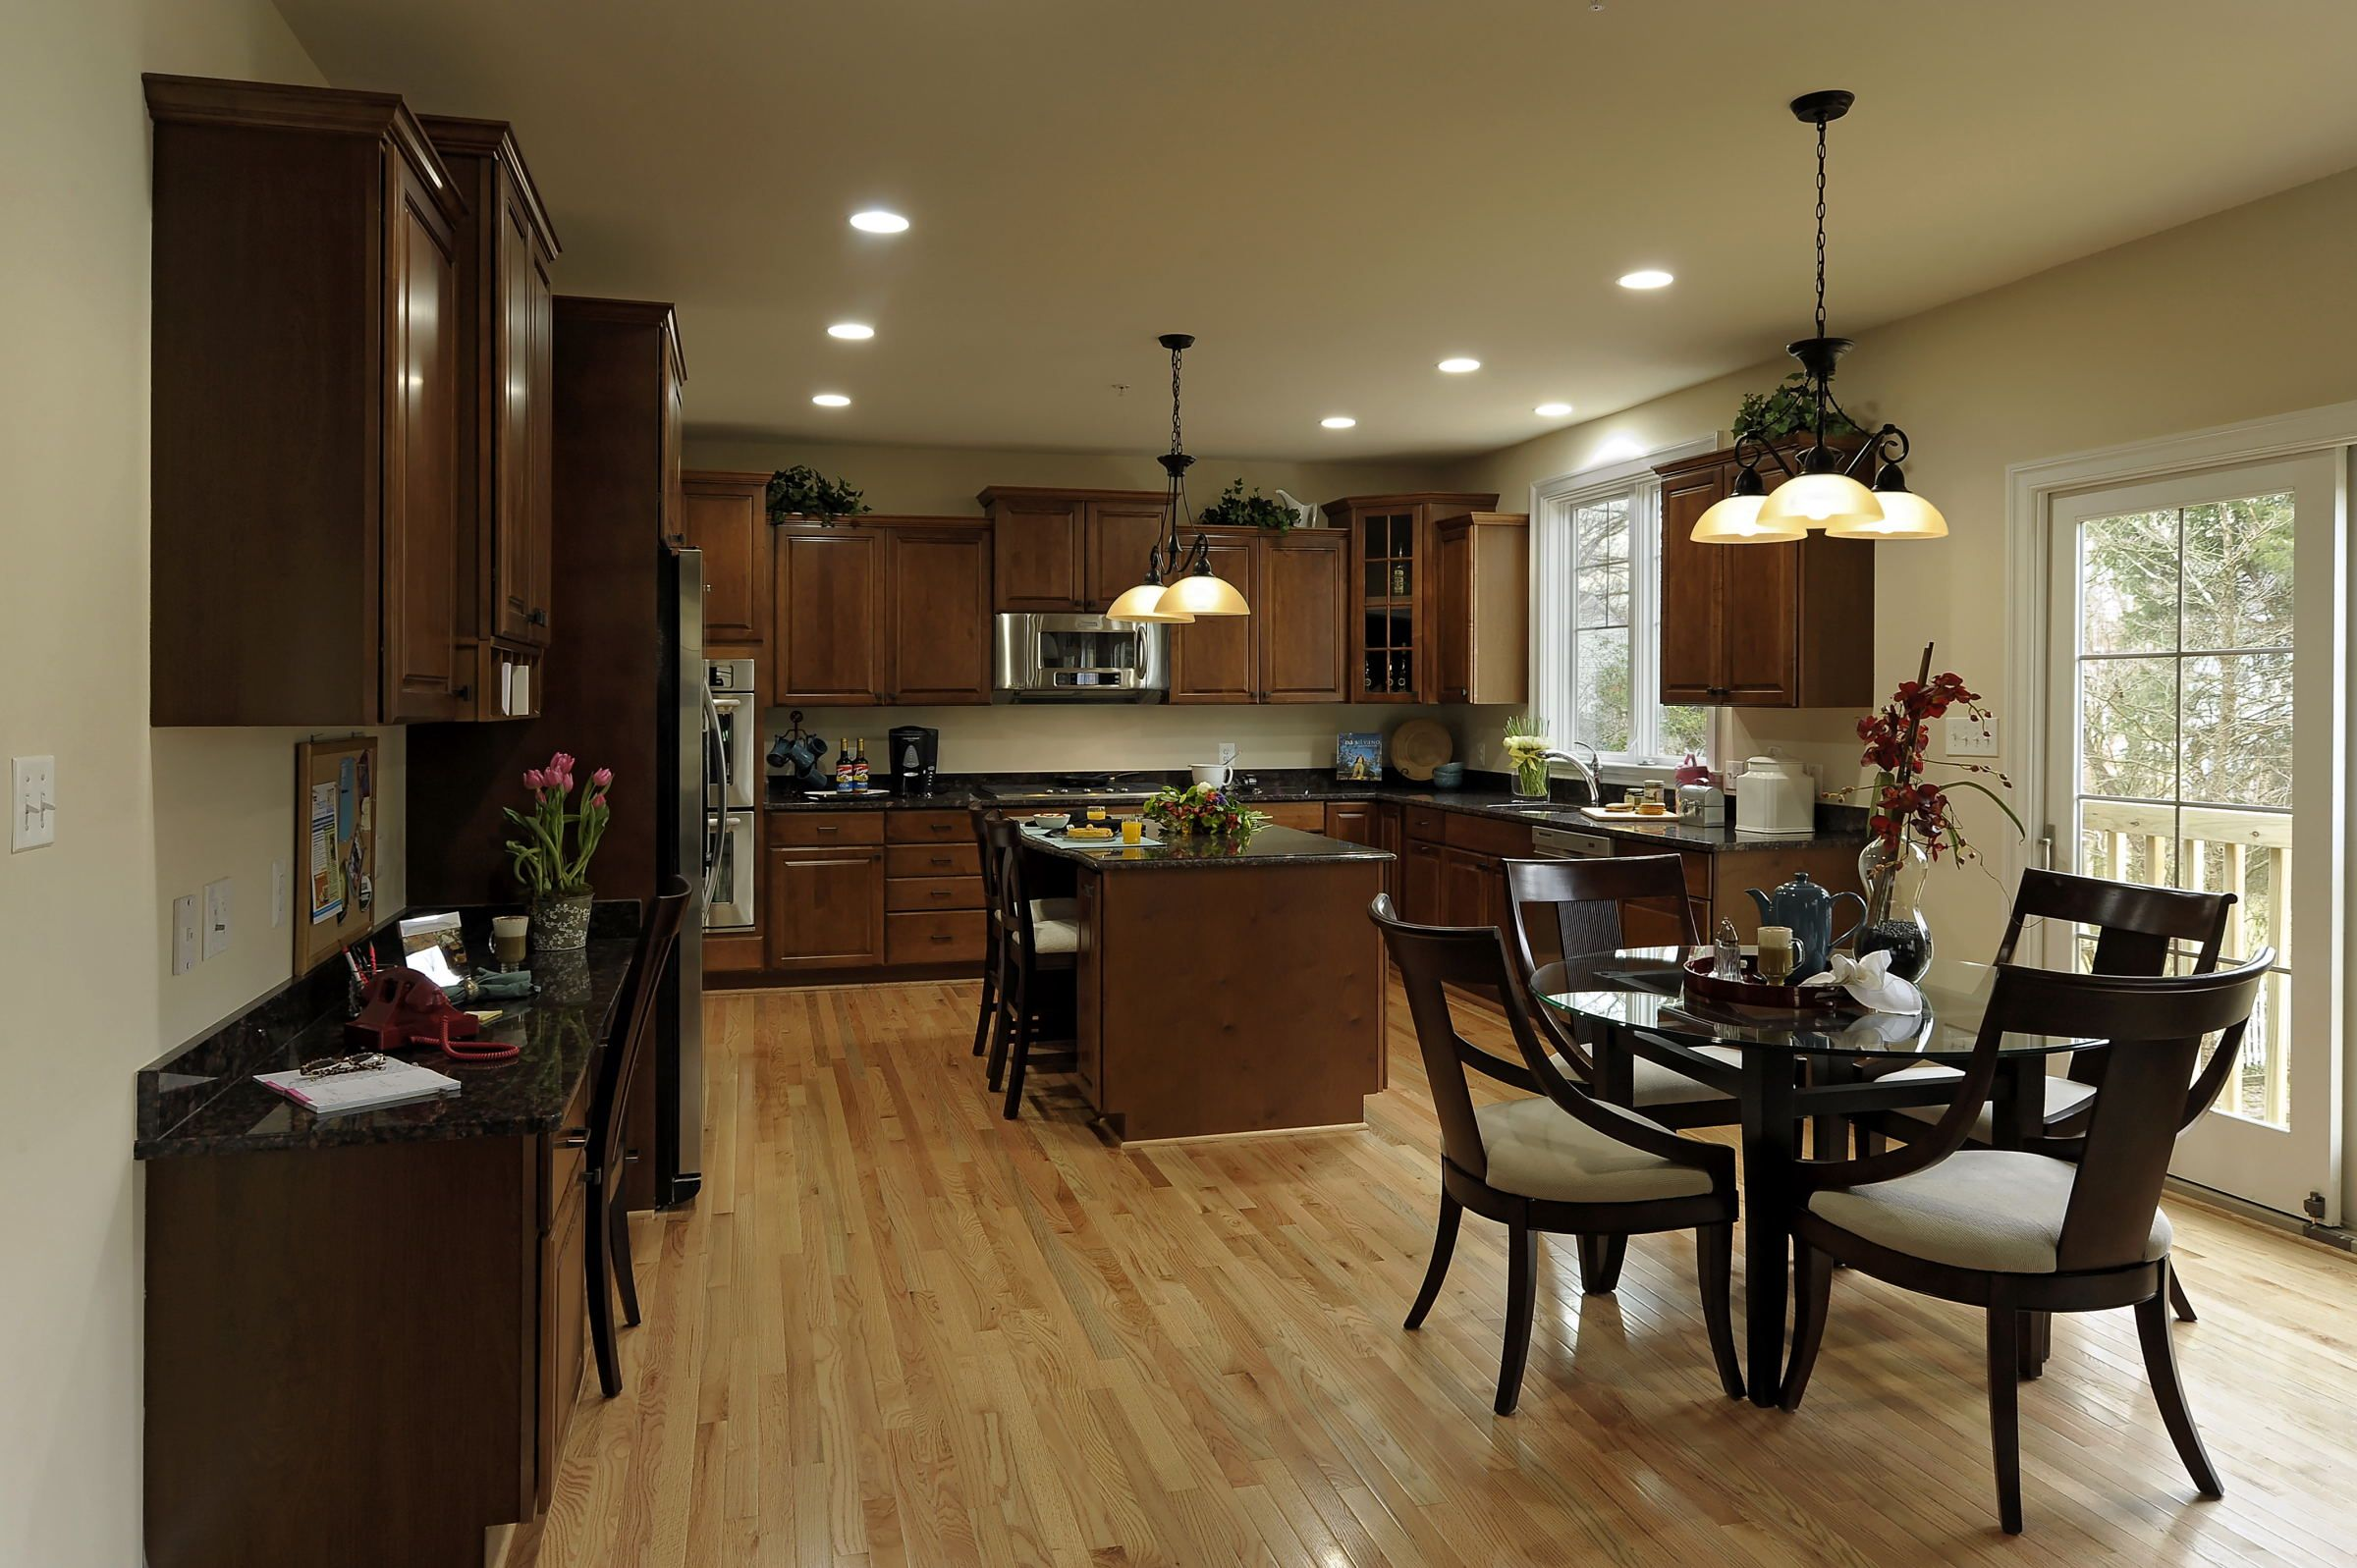 New Era Modular Homes North American Series Kitchen